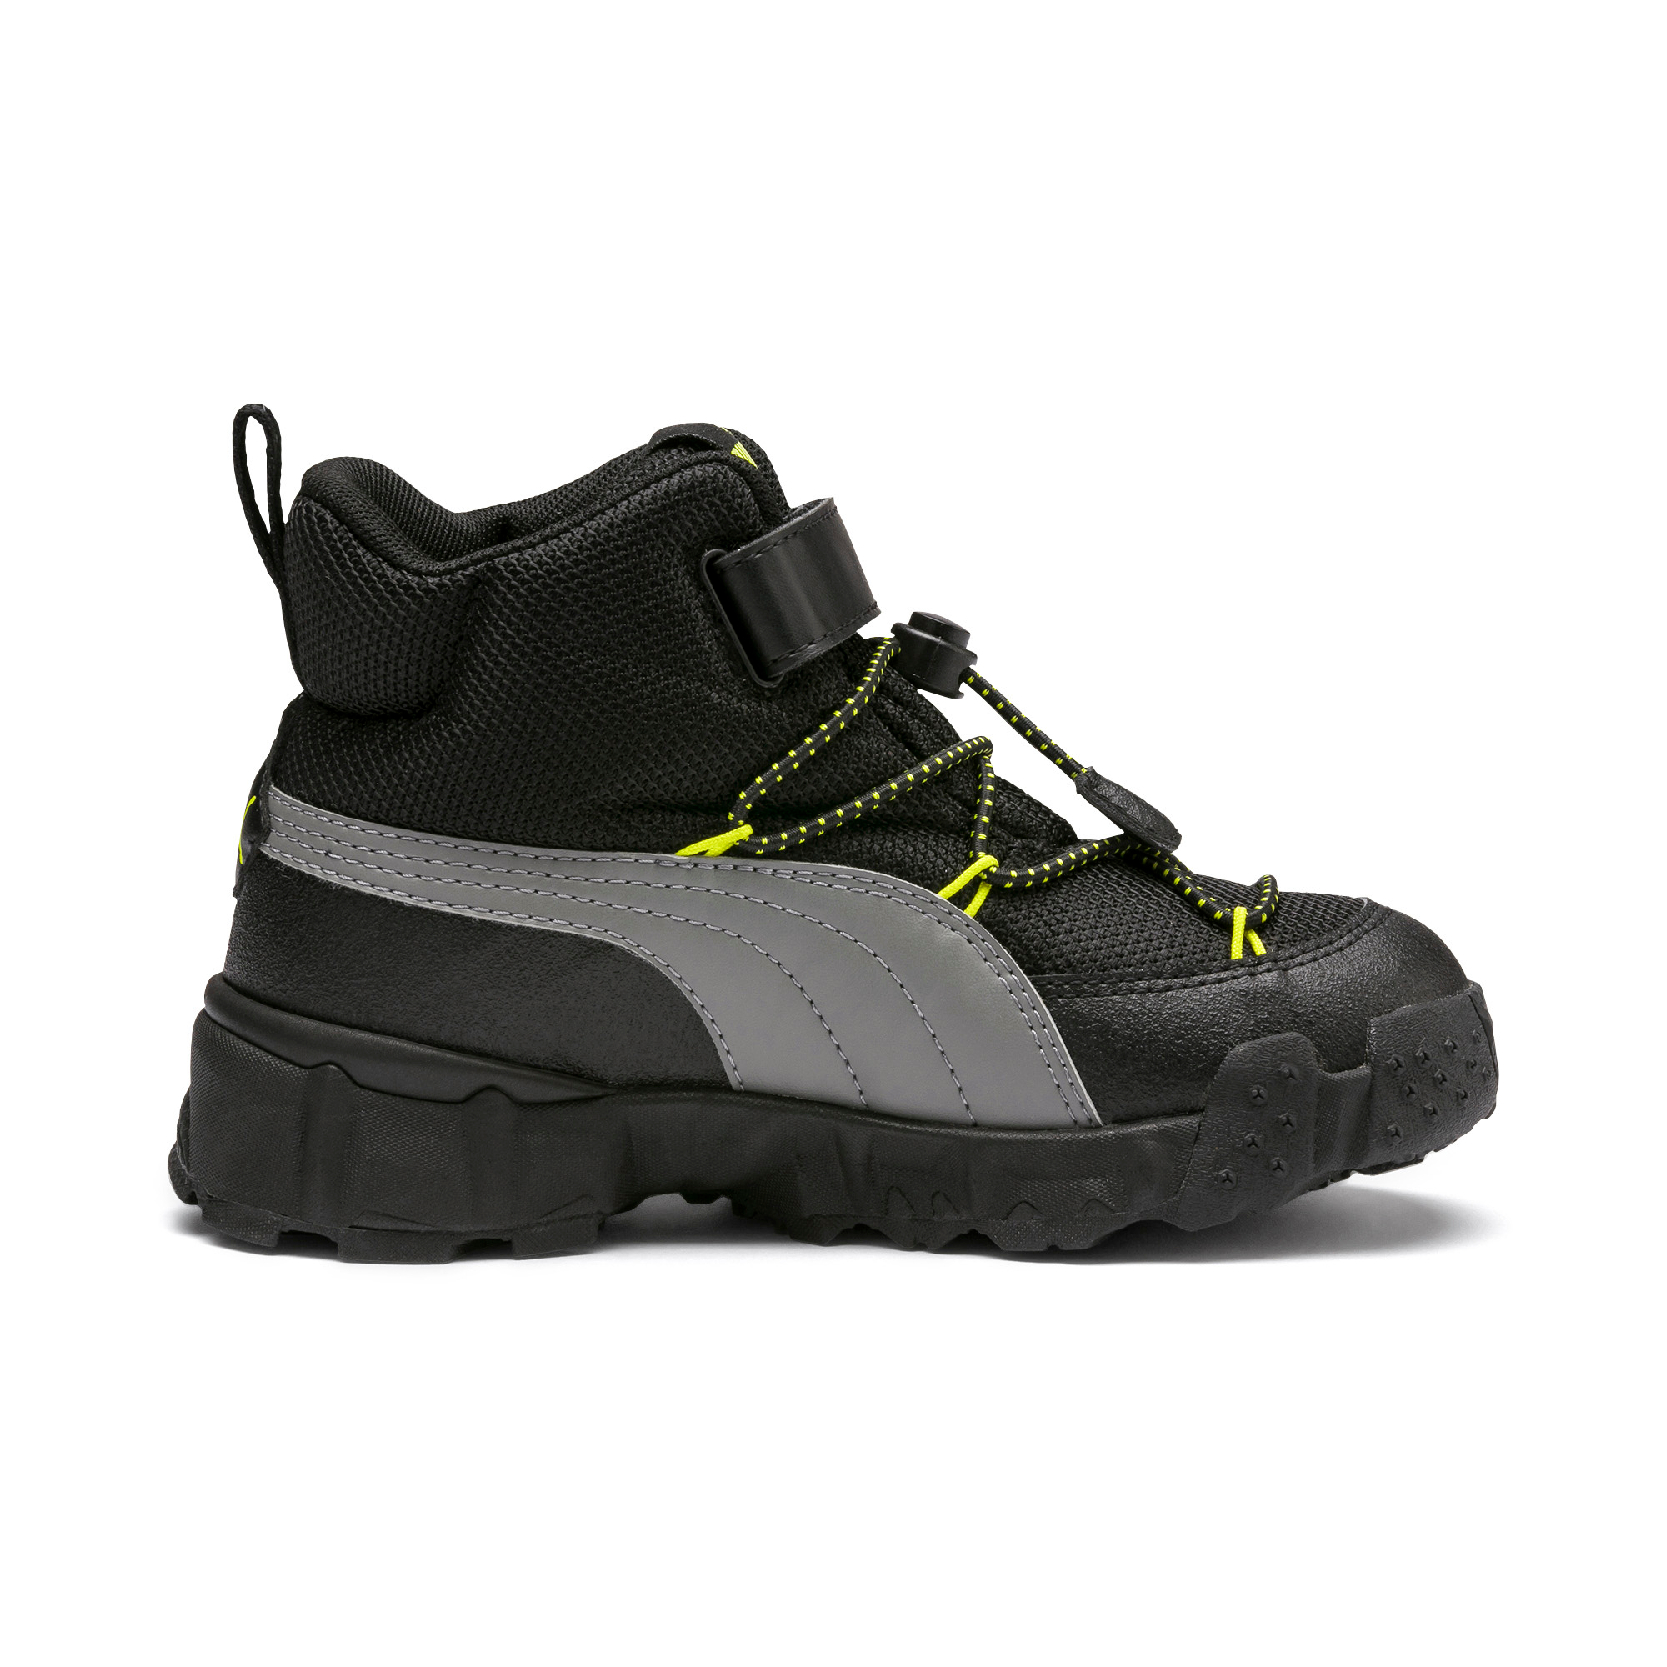 Puma Maka Puretex V PS støvle, castlerock, UK 10